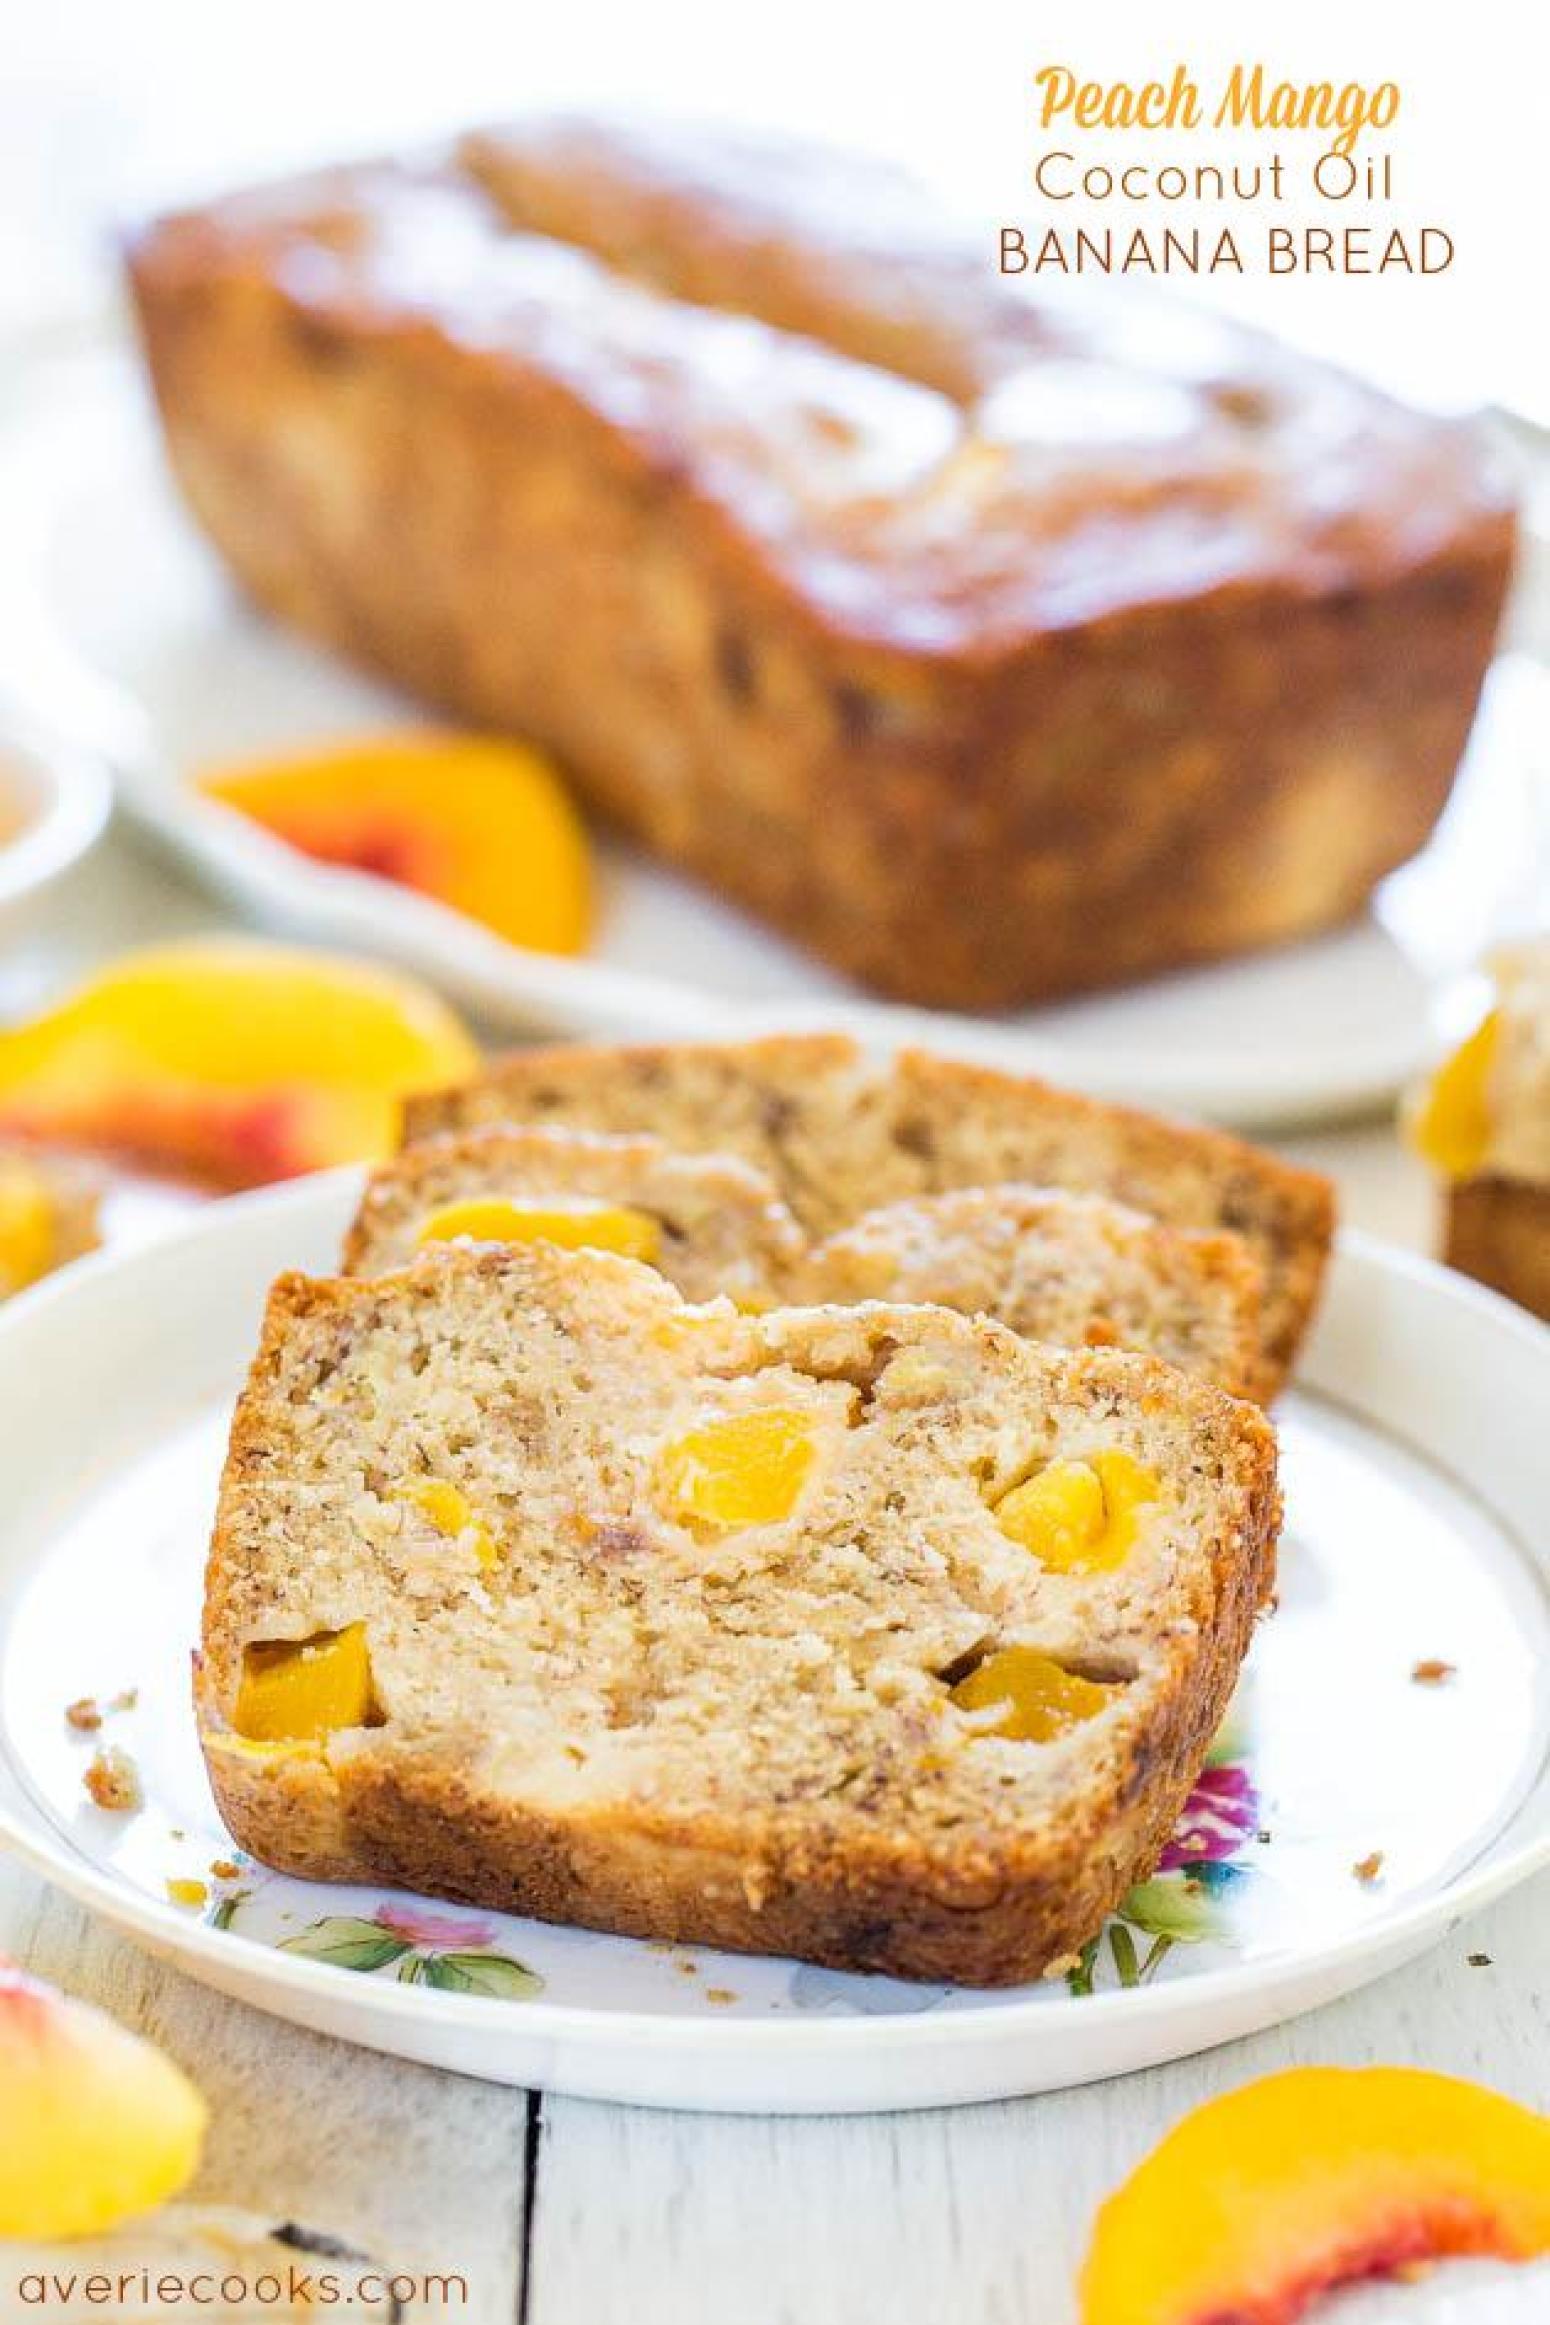 Peach Mango Coconut Oil Banana Bread Recipe Just A Pinch